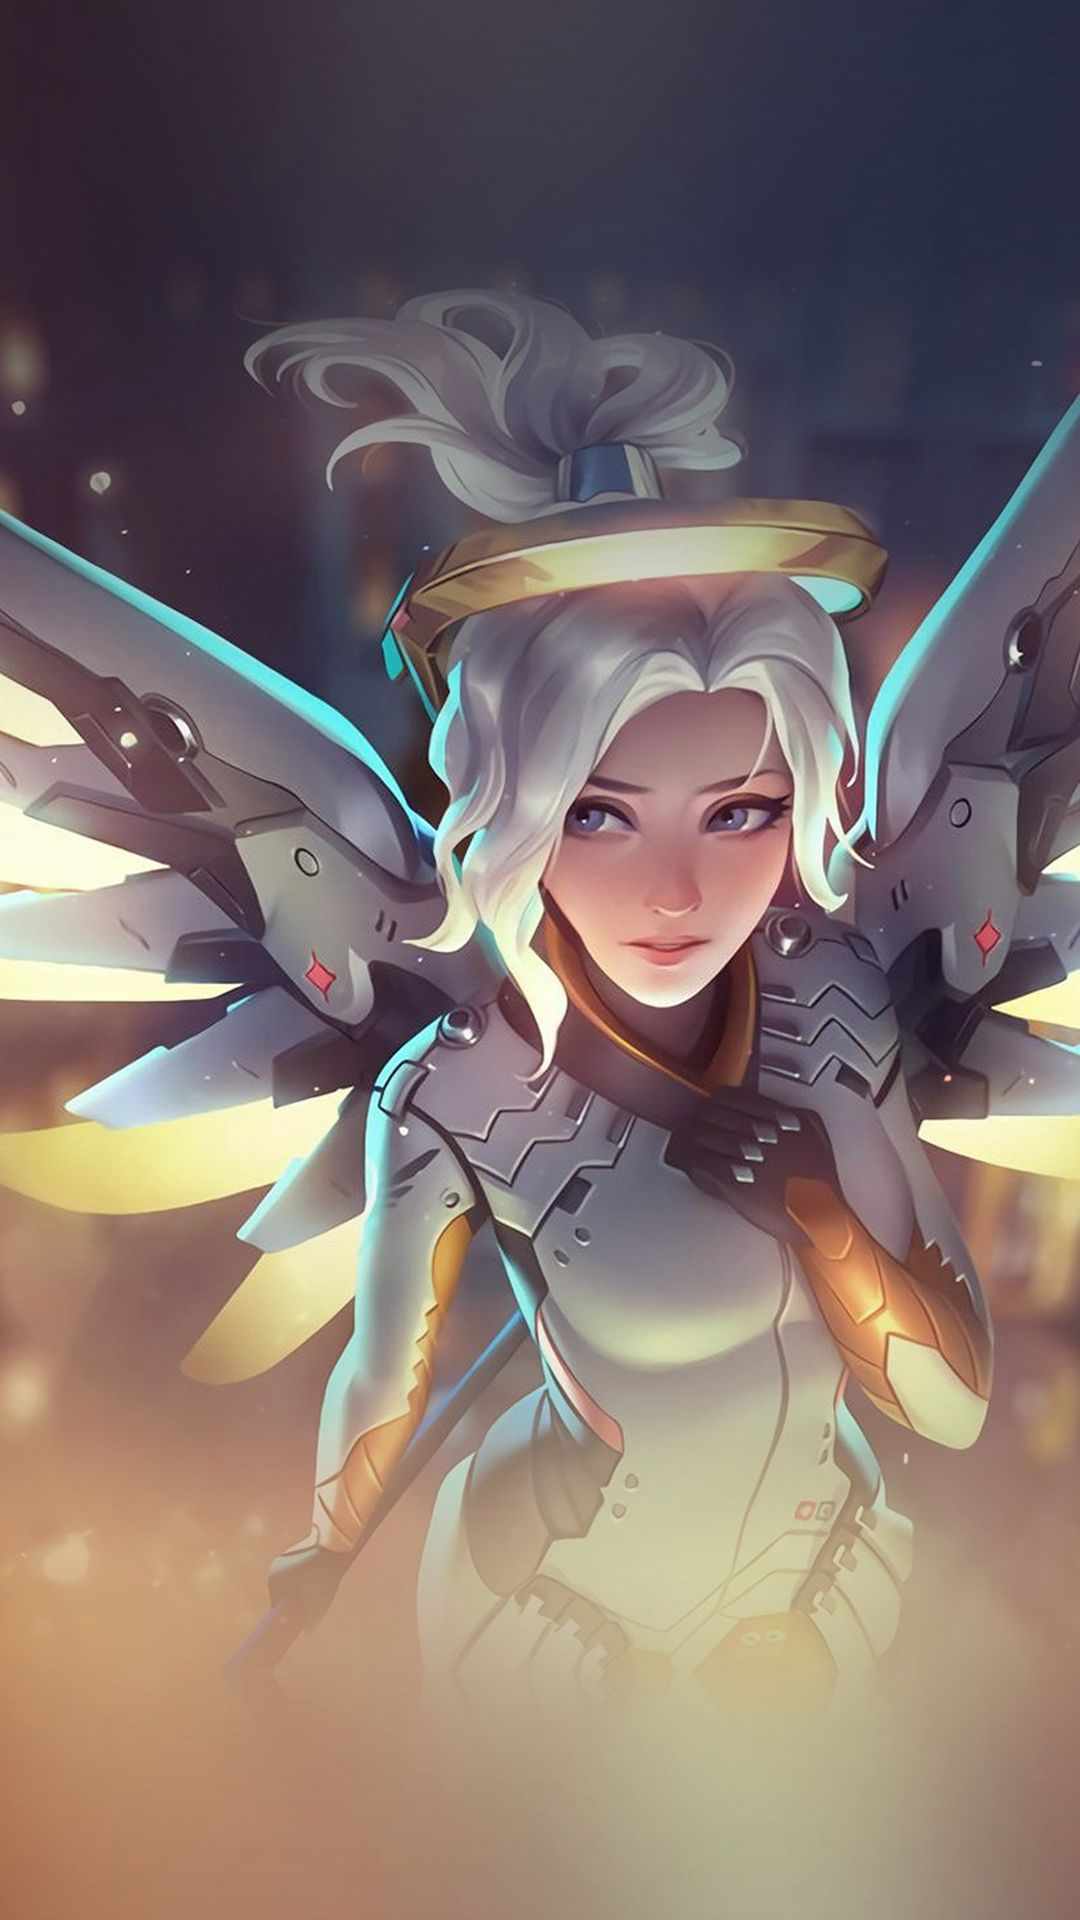 Mercy Overwatch Angel Healer Game Art Illustration iPhone